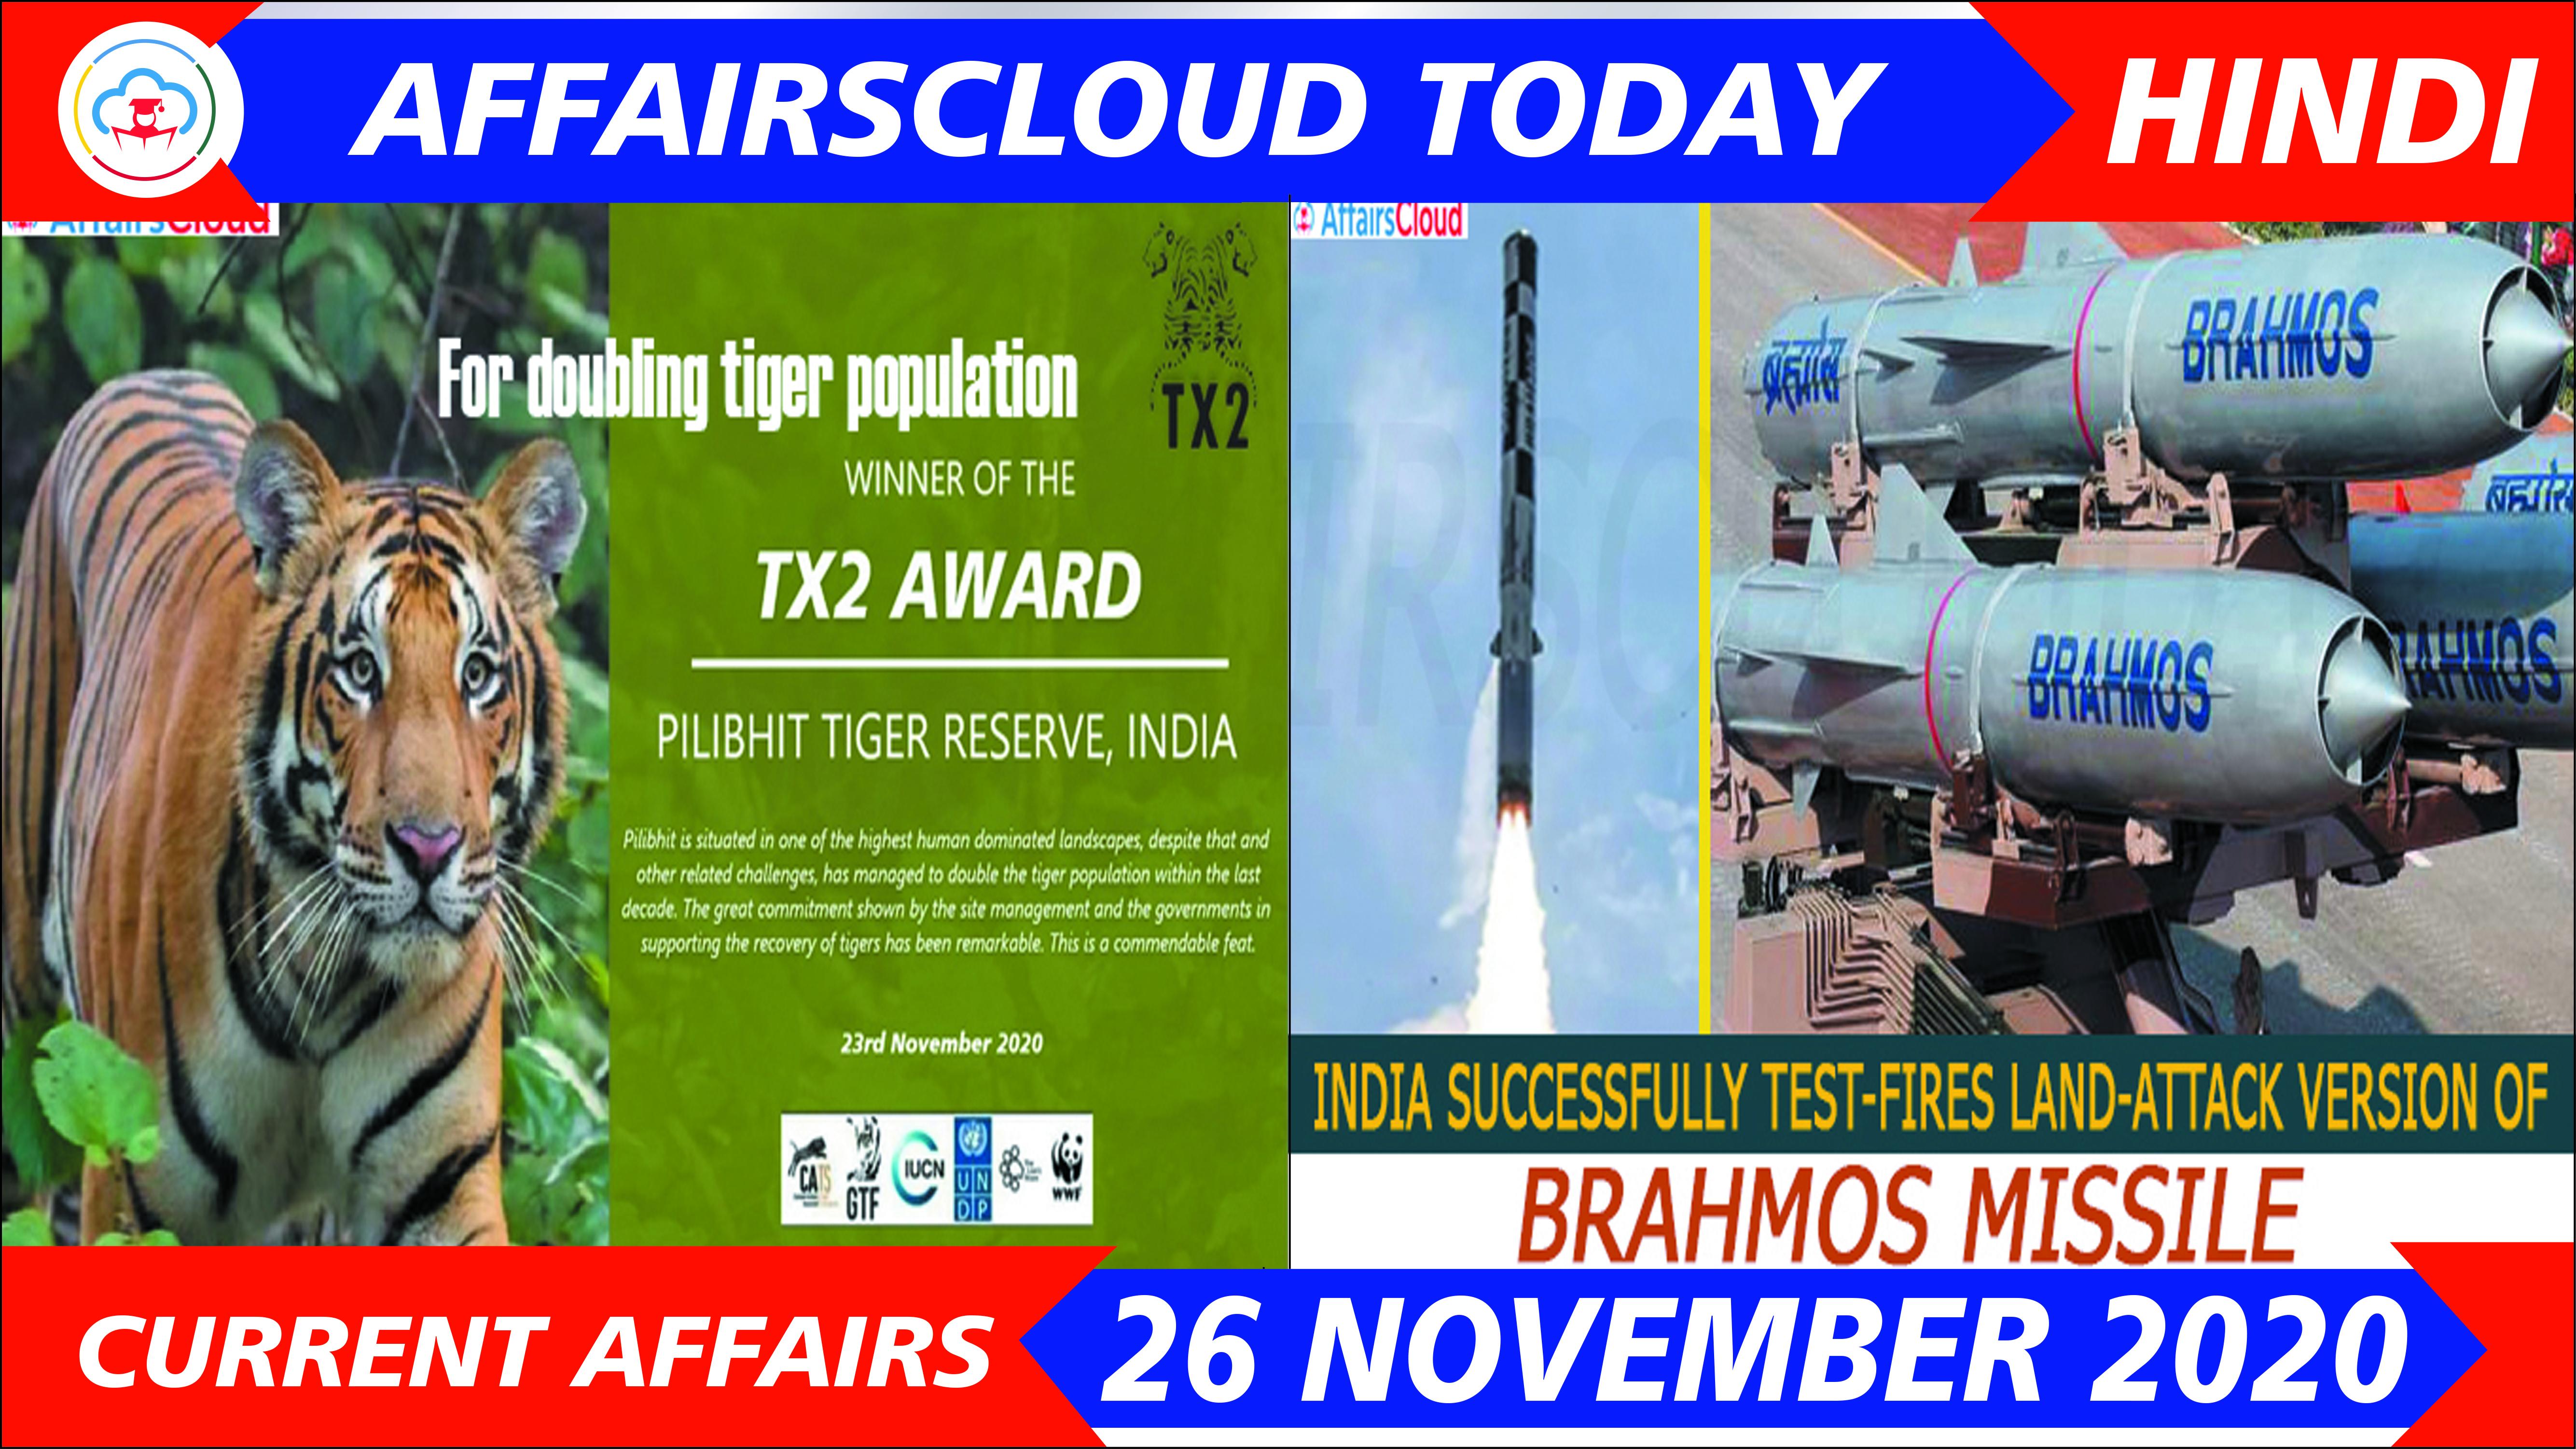 Current Affairs November 26 2020 Hindi.jpg